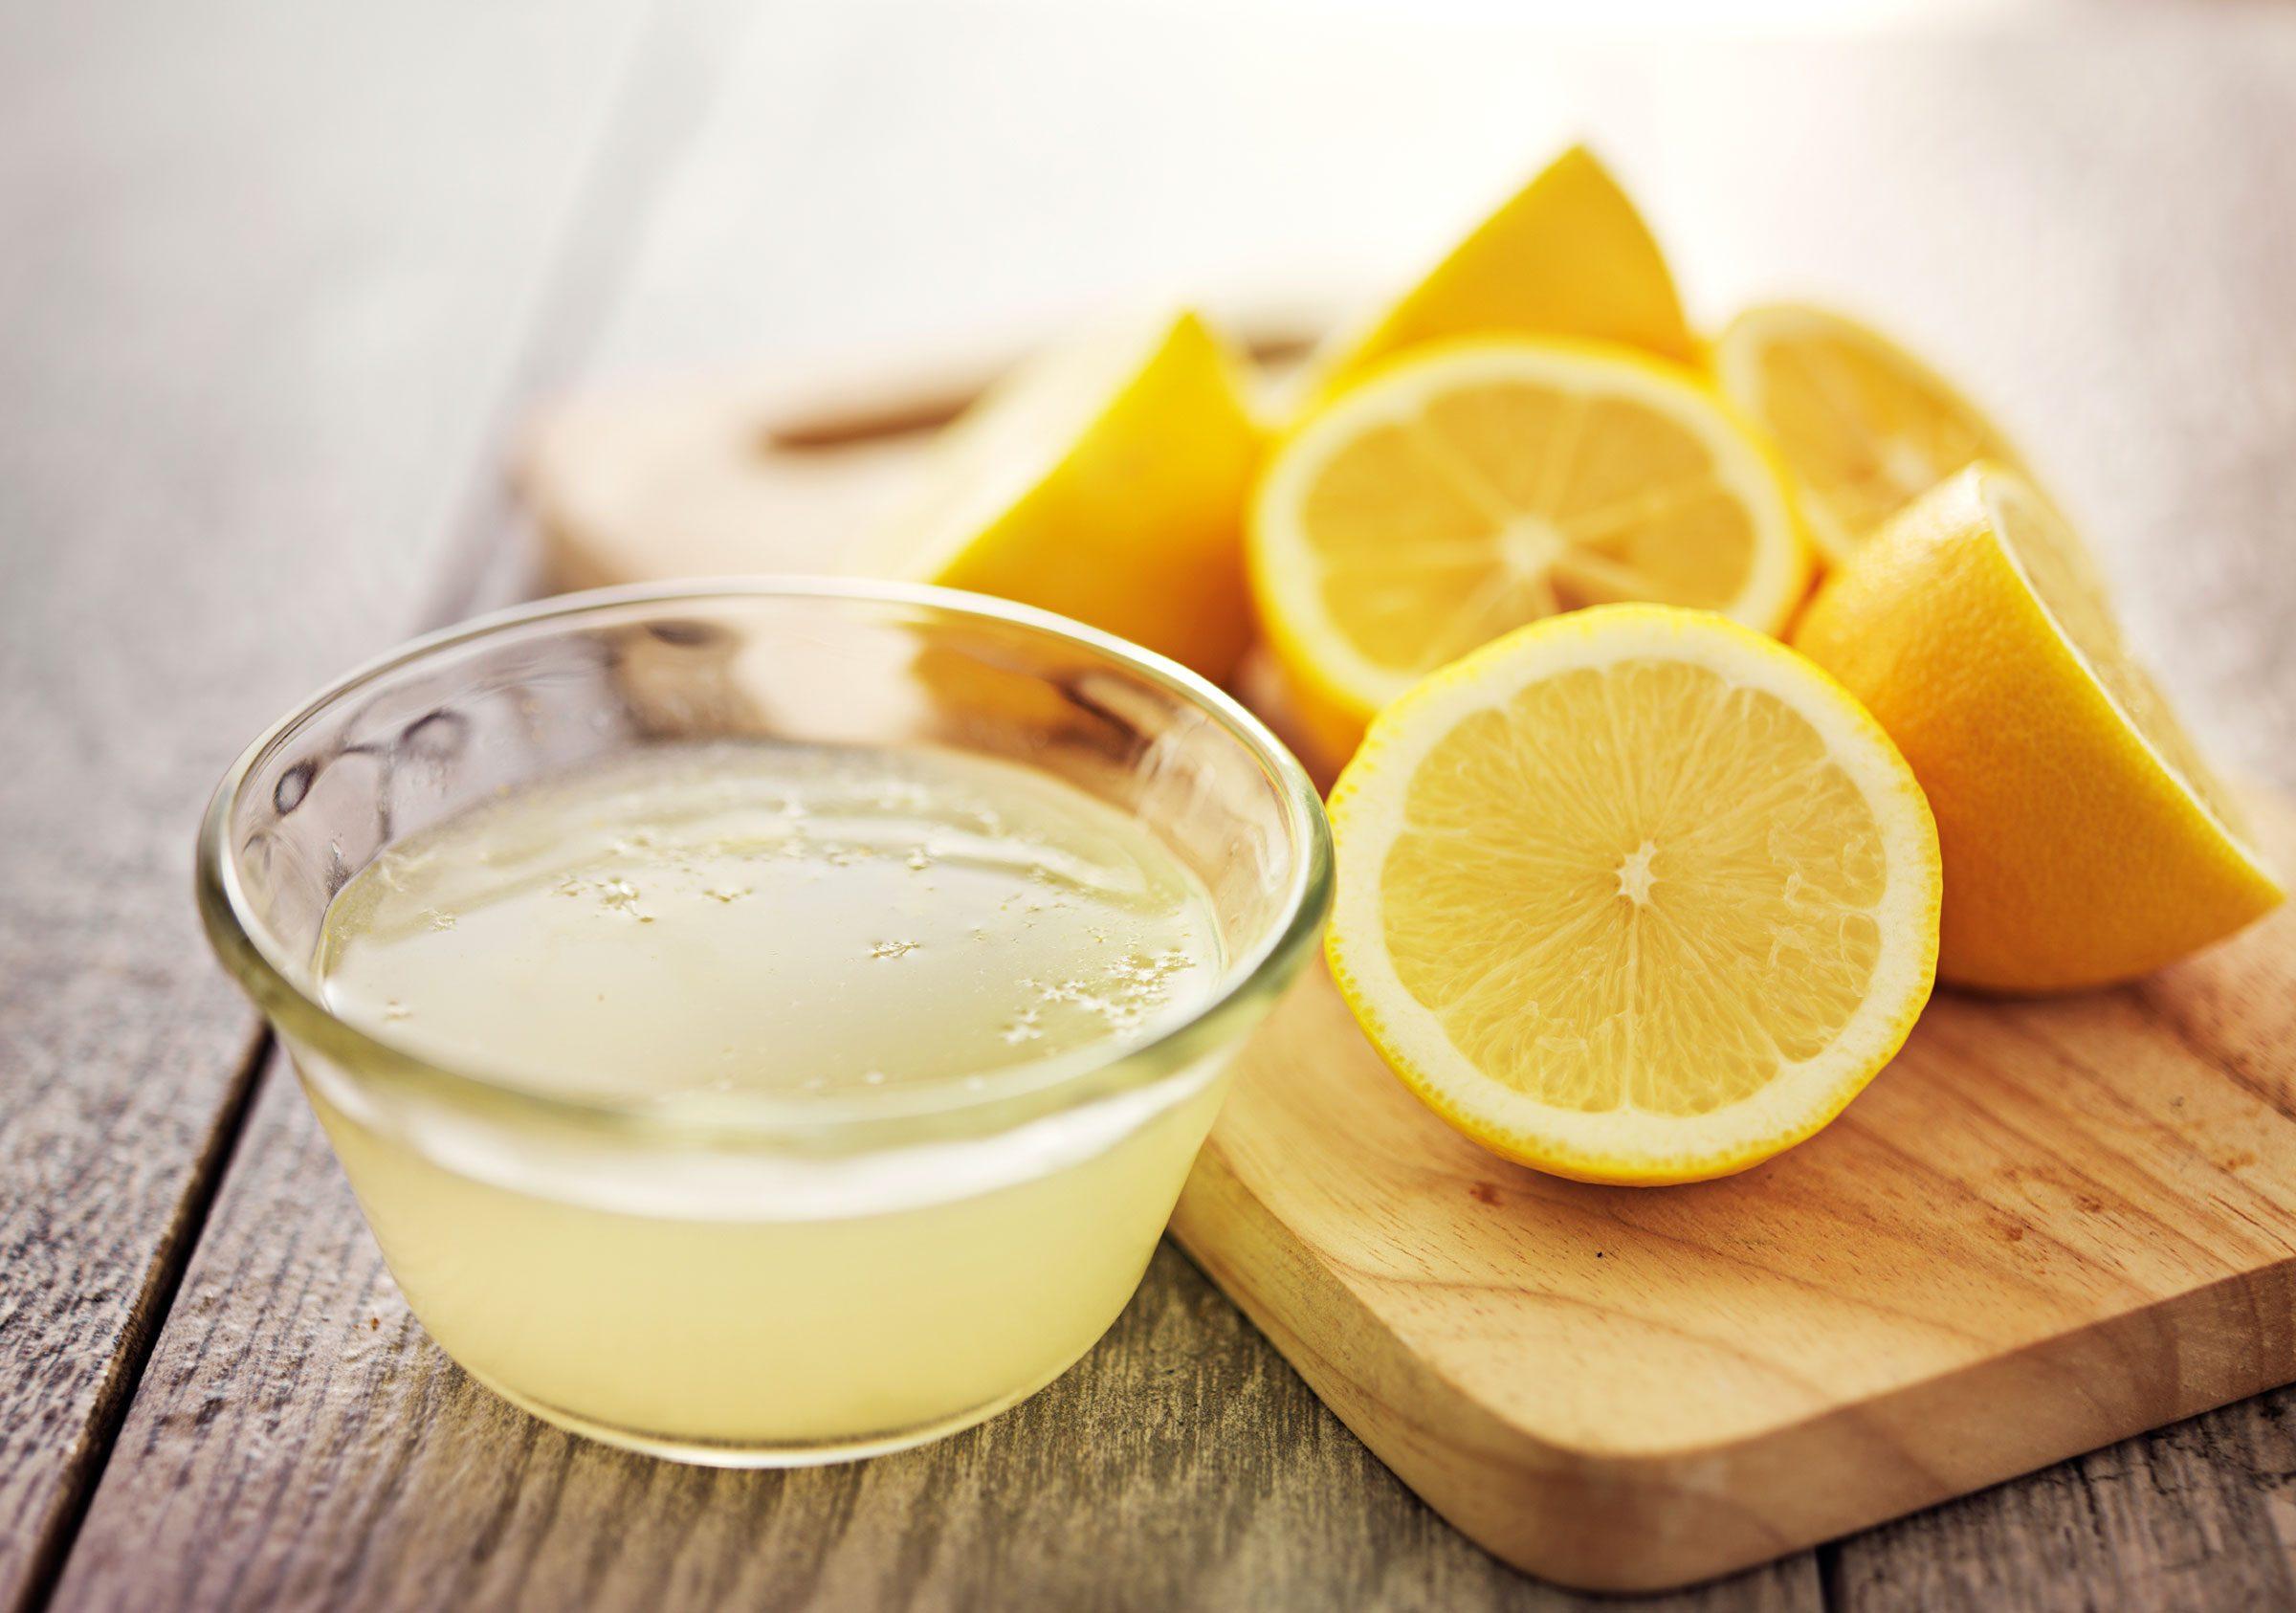 Juice a lemon with a microwave